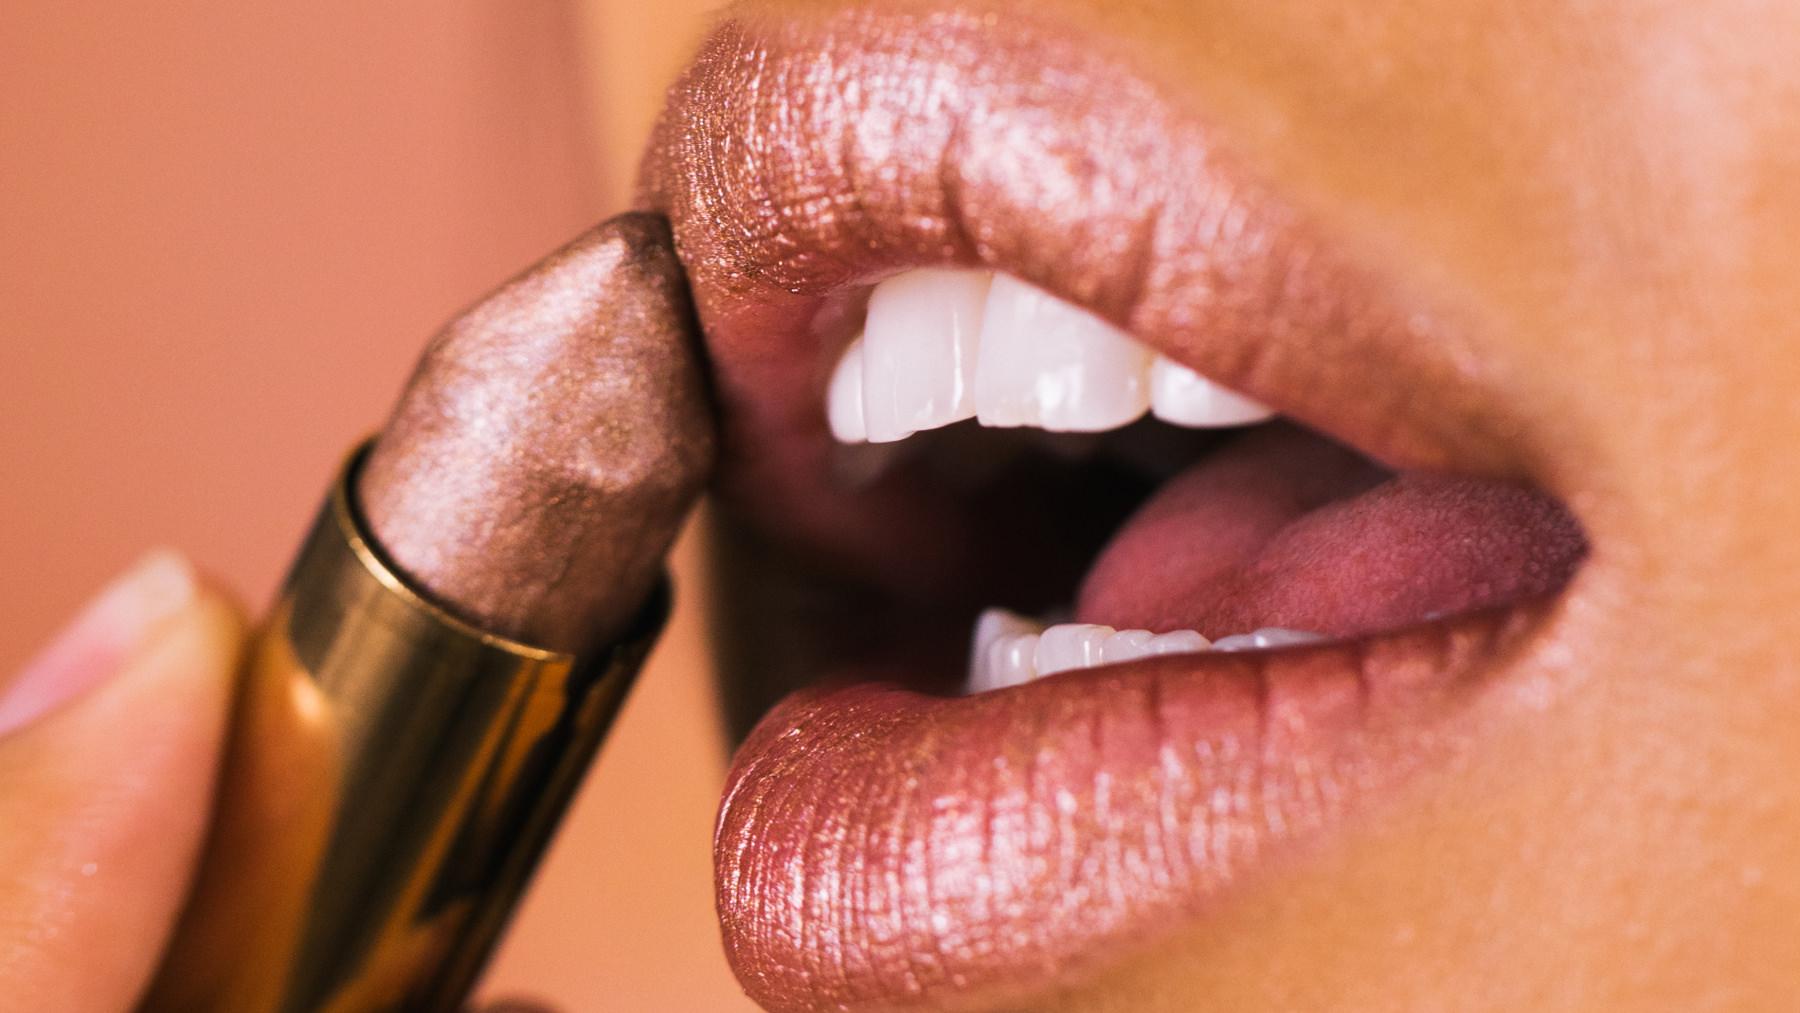 a pair of lips applying lipstick